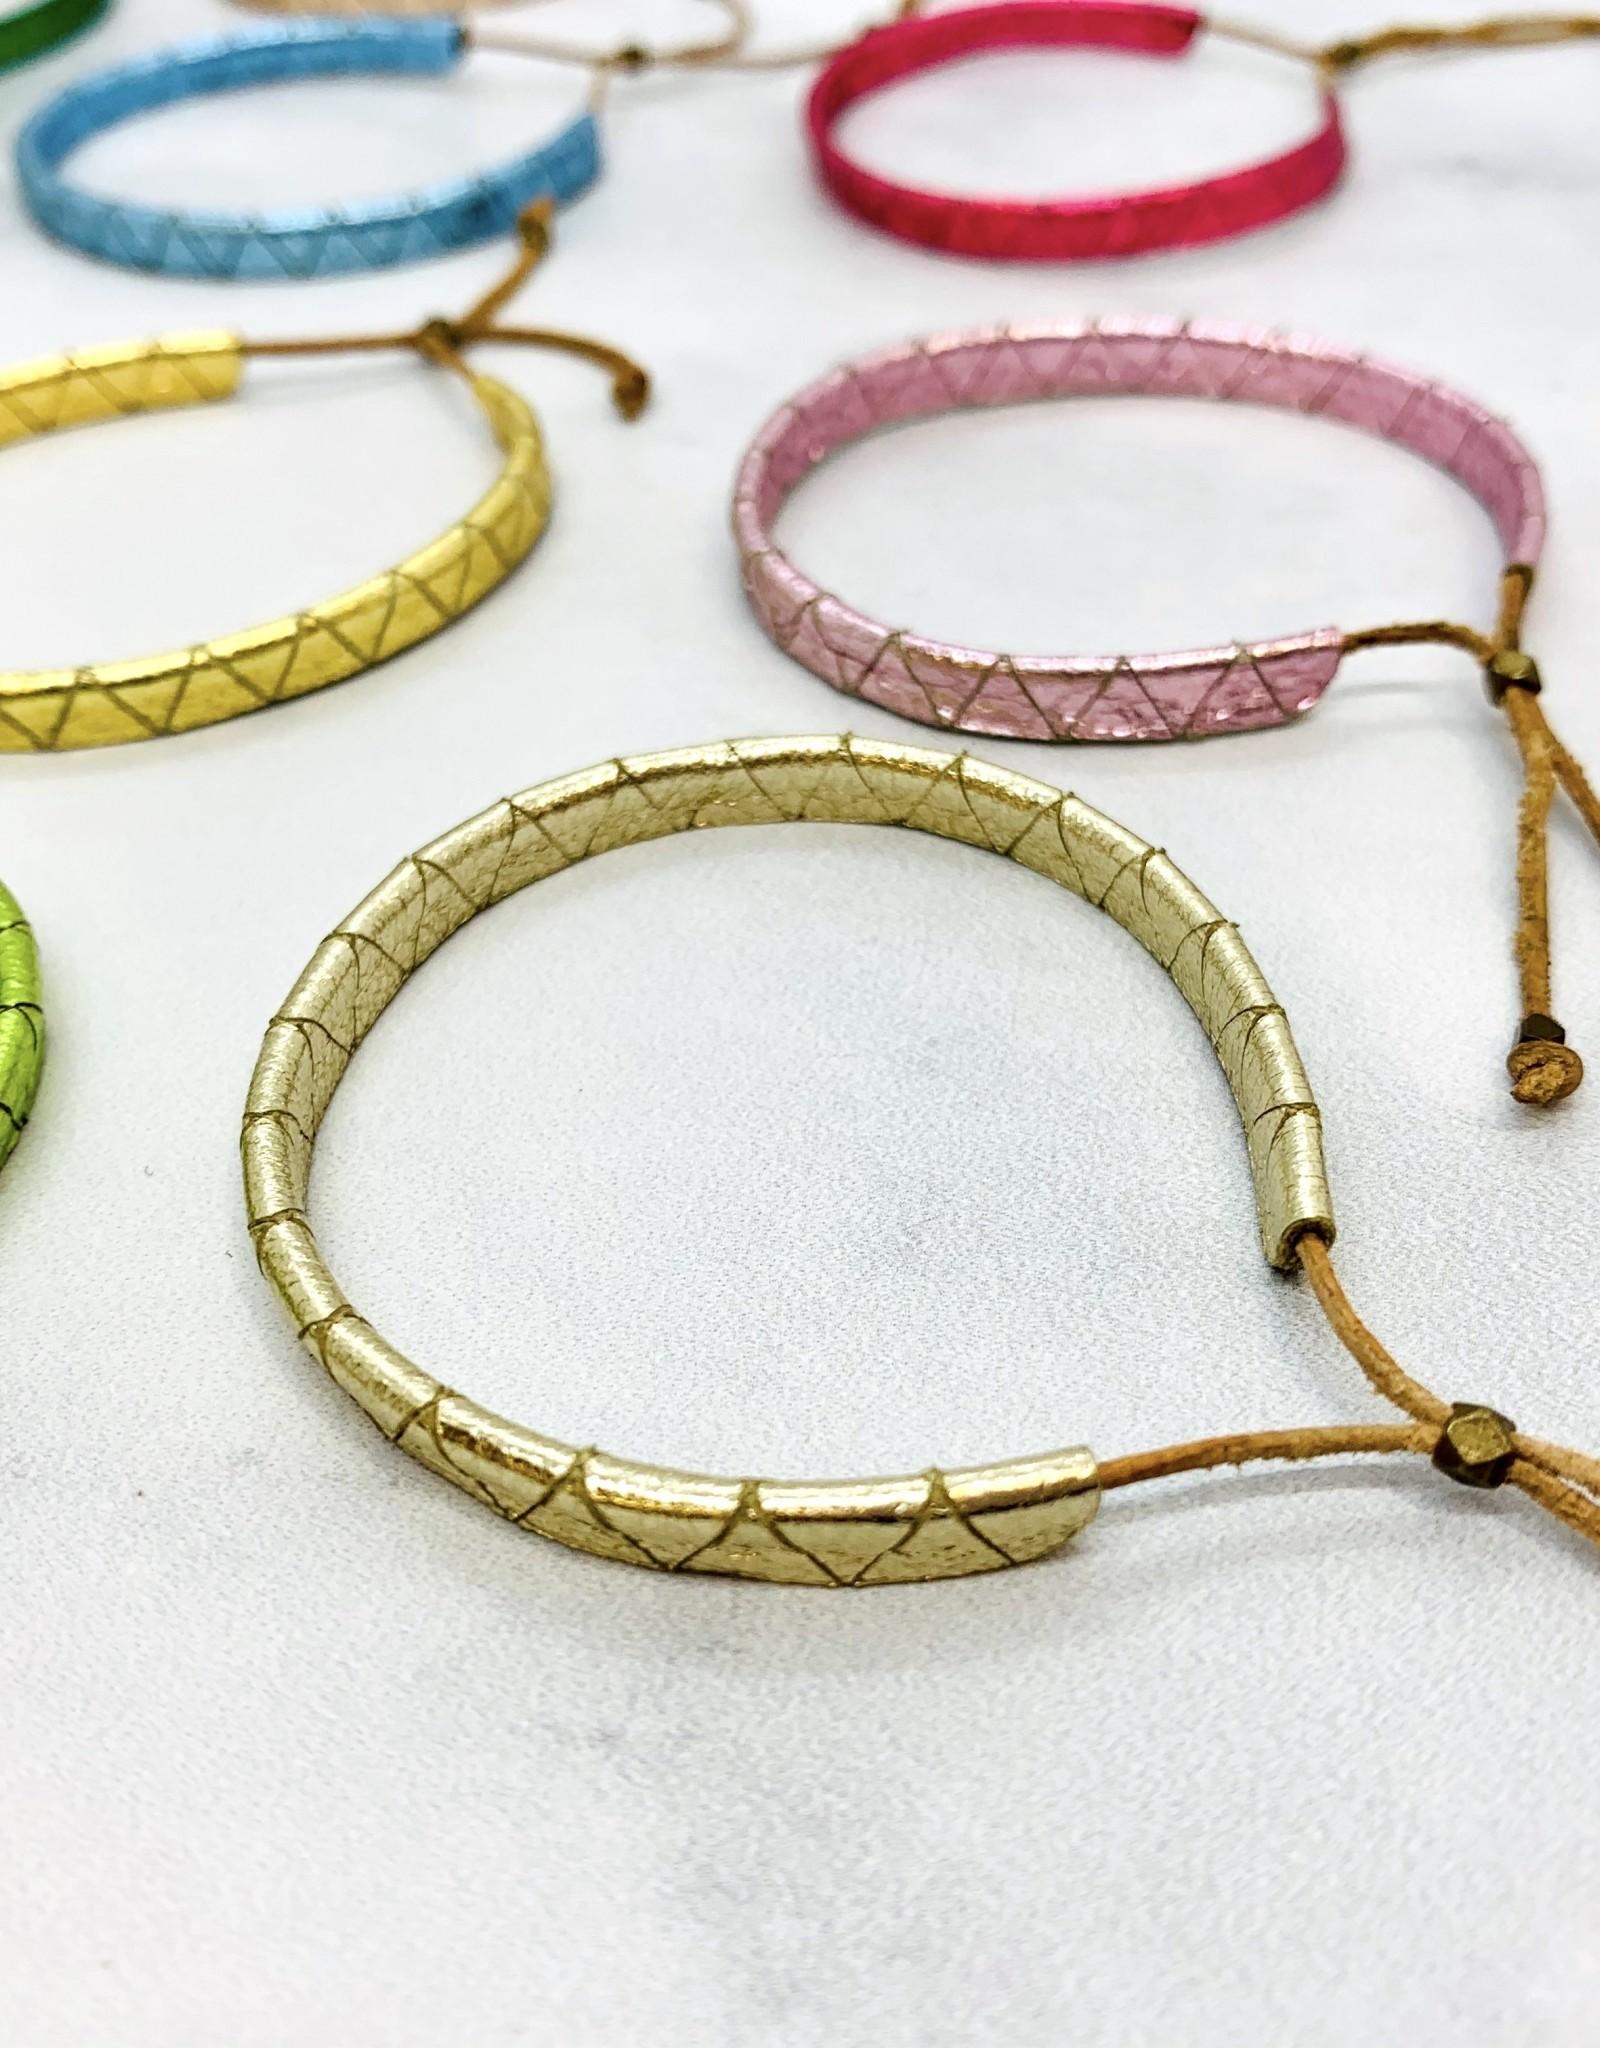 MollyM Handmade Metallic Leather Lariat Bracelet